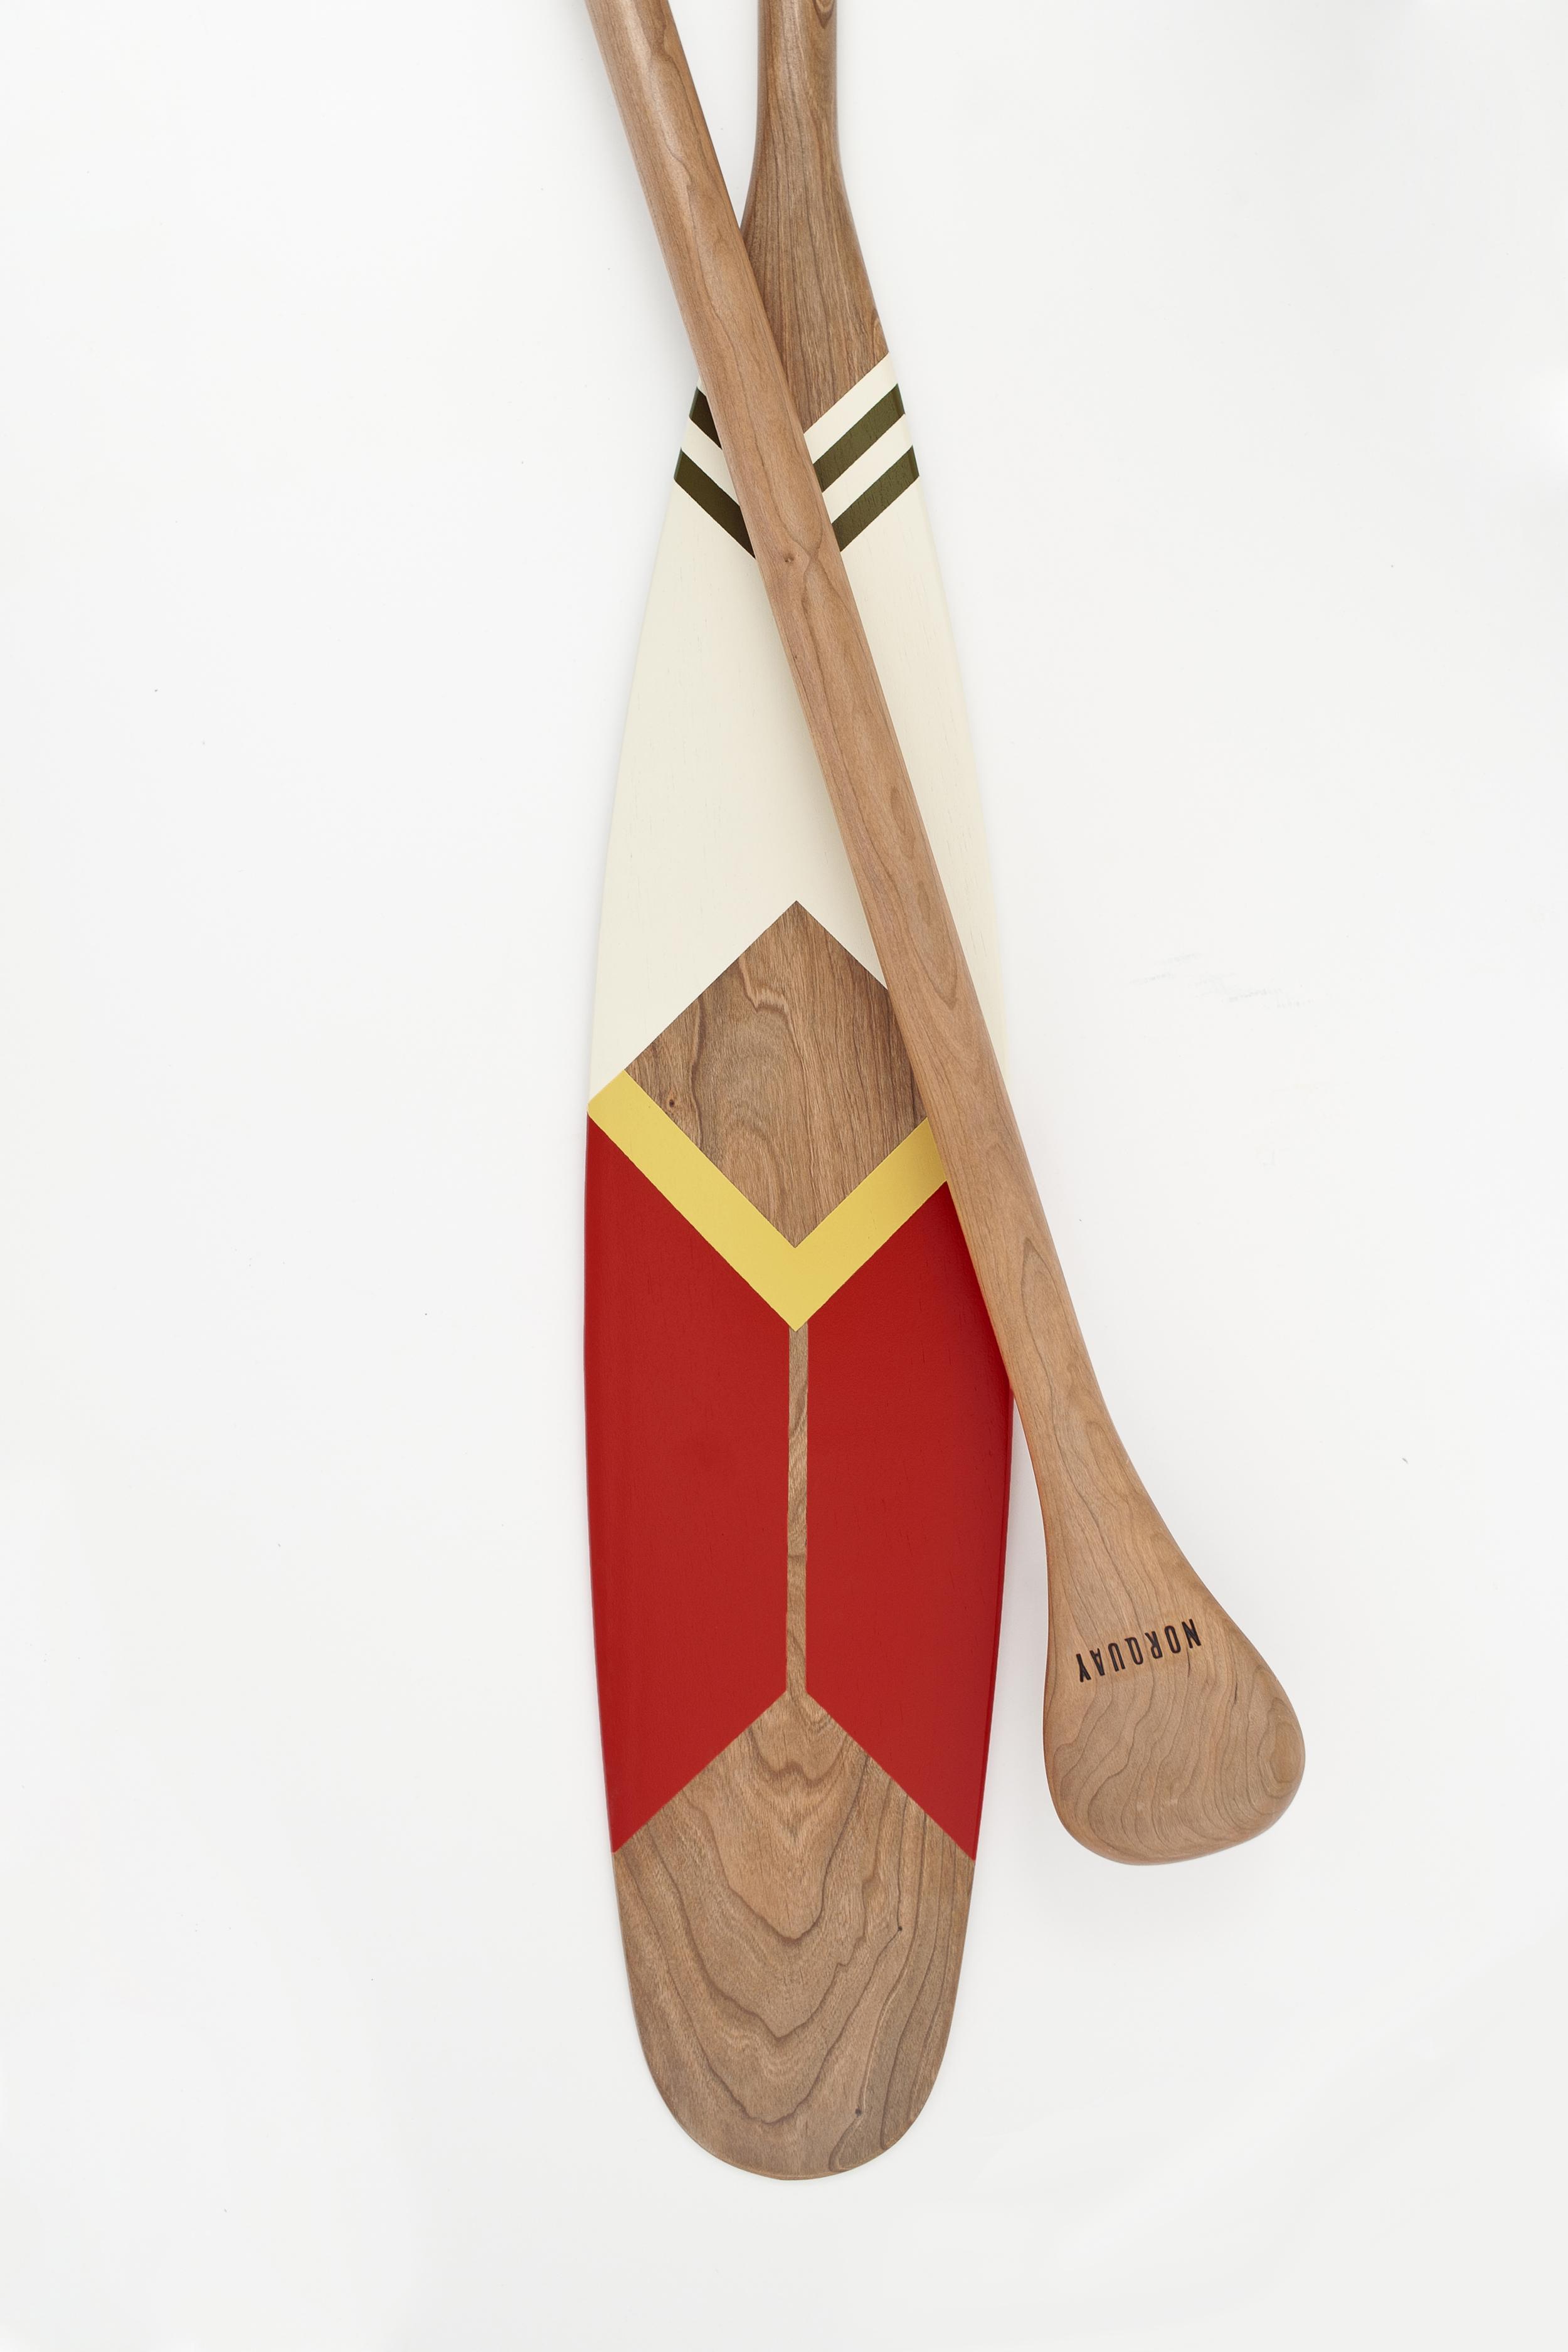 "Hunter . 57"" Ottertail Canoe Paddle"